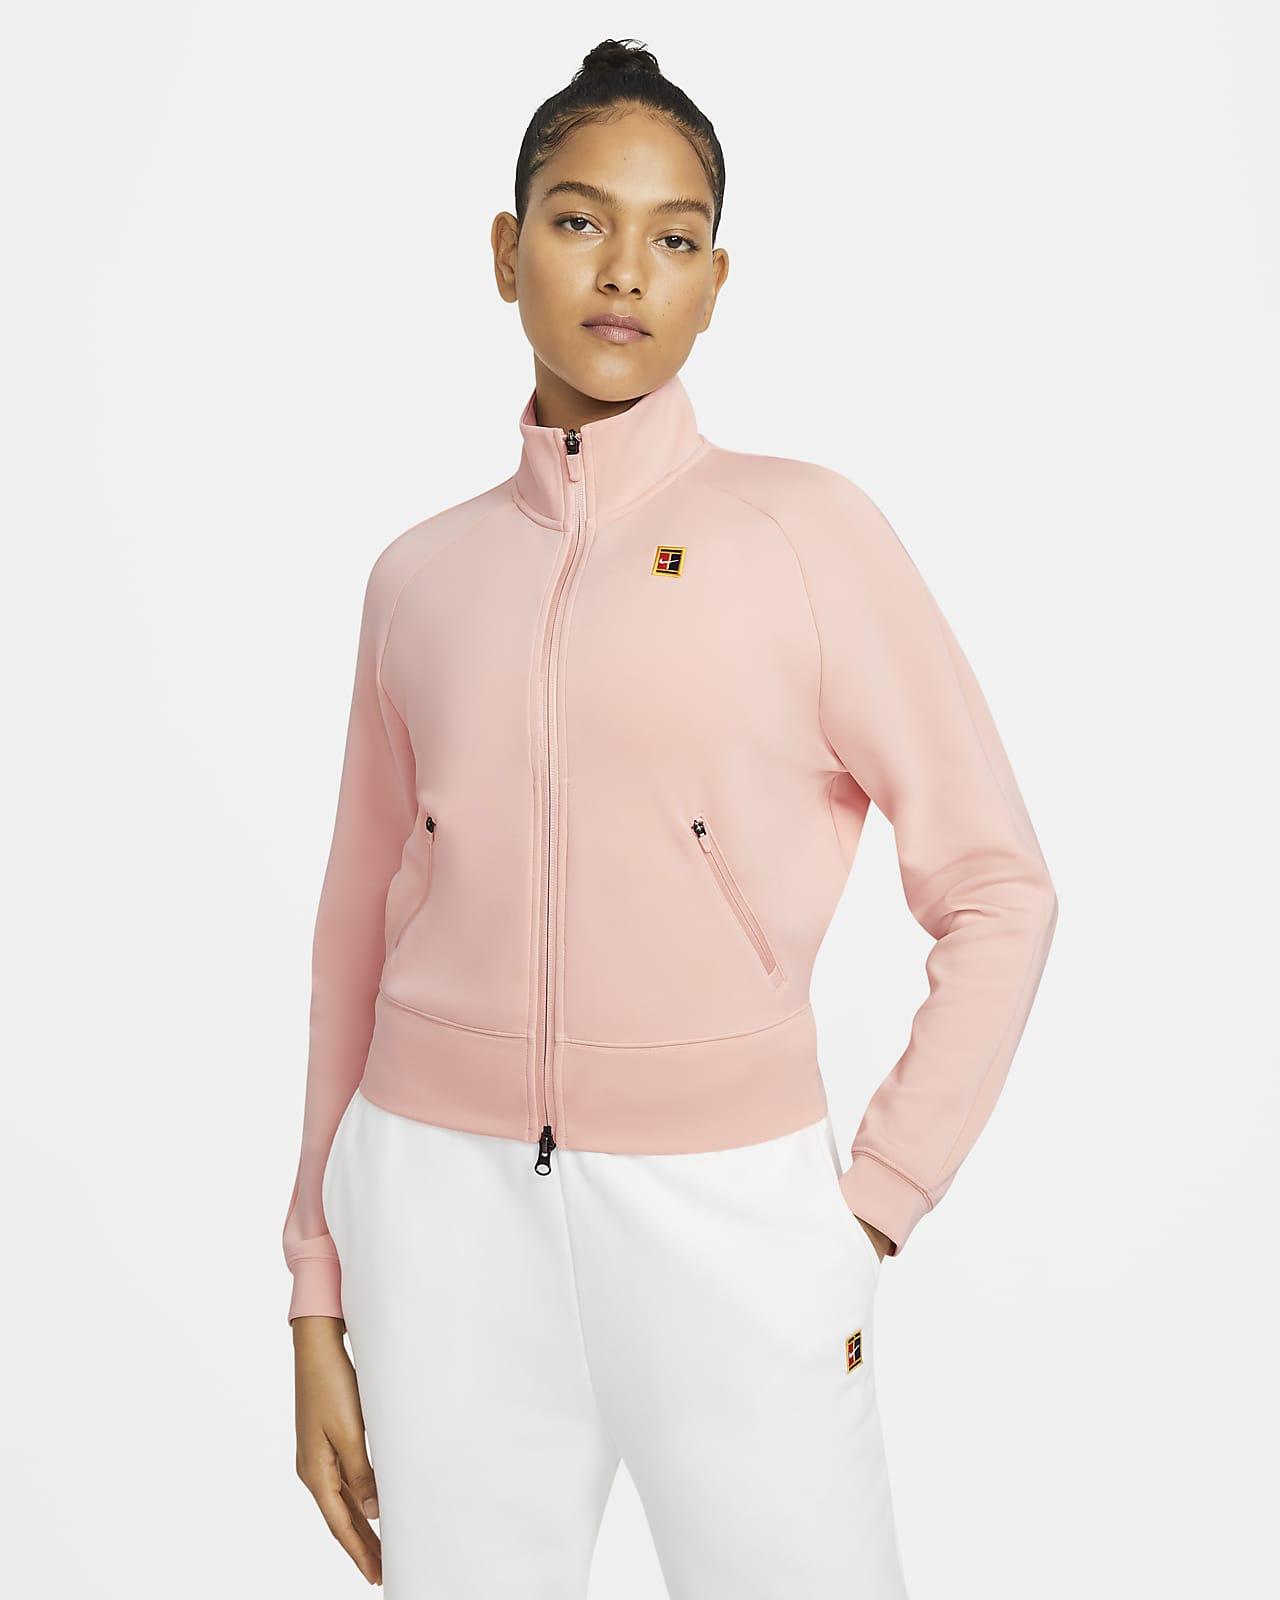 Giacca da tennis con zip a tutta lunghezza NikeCourt - Donna